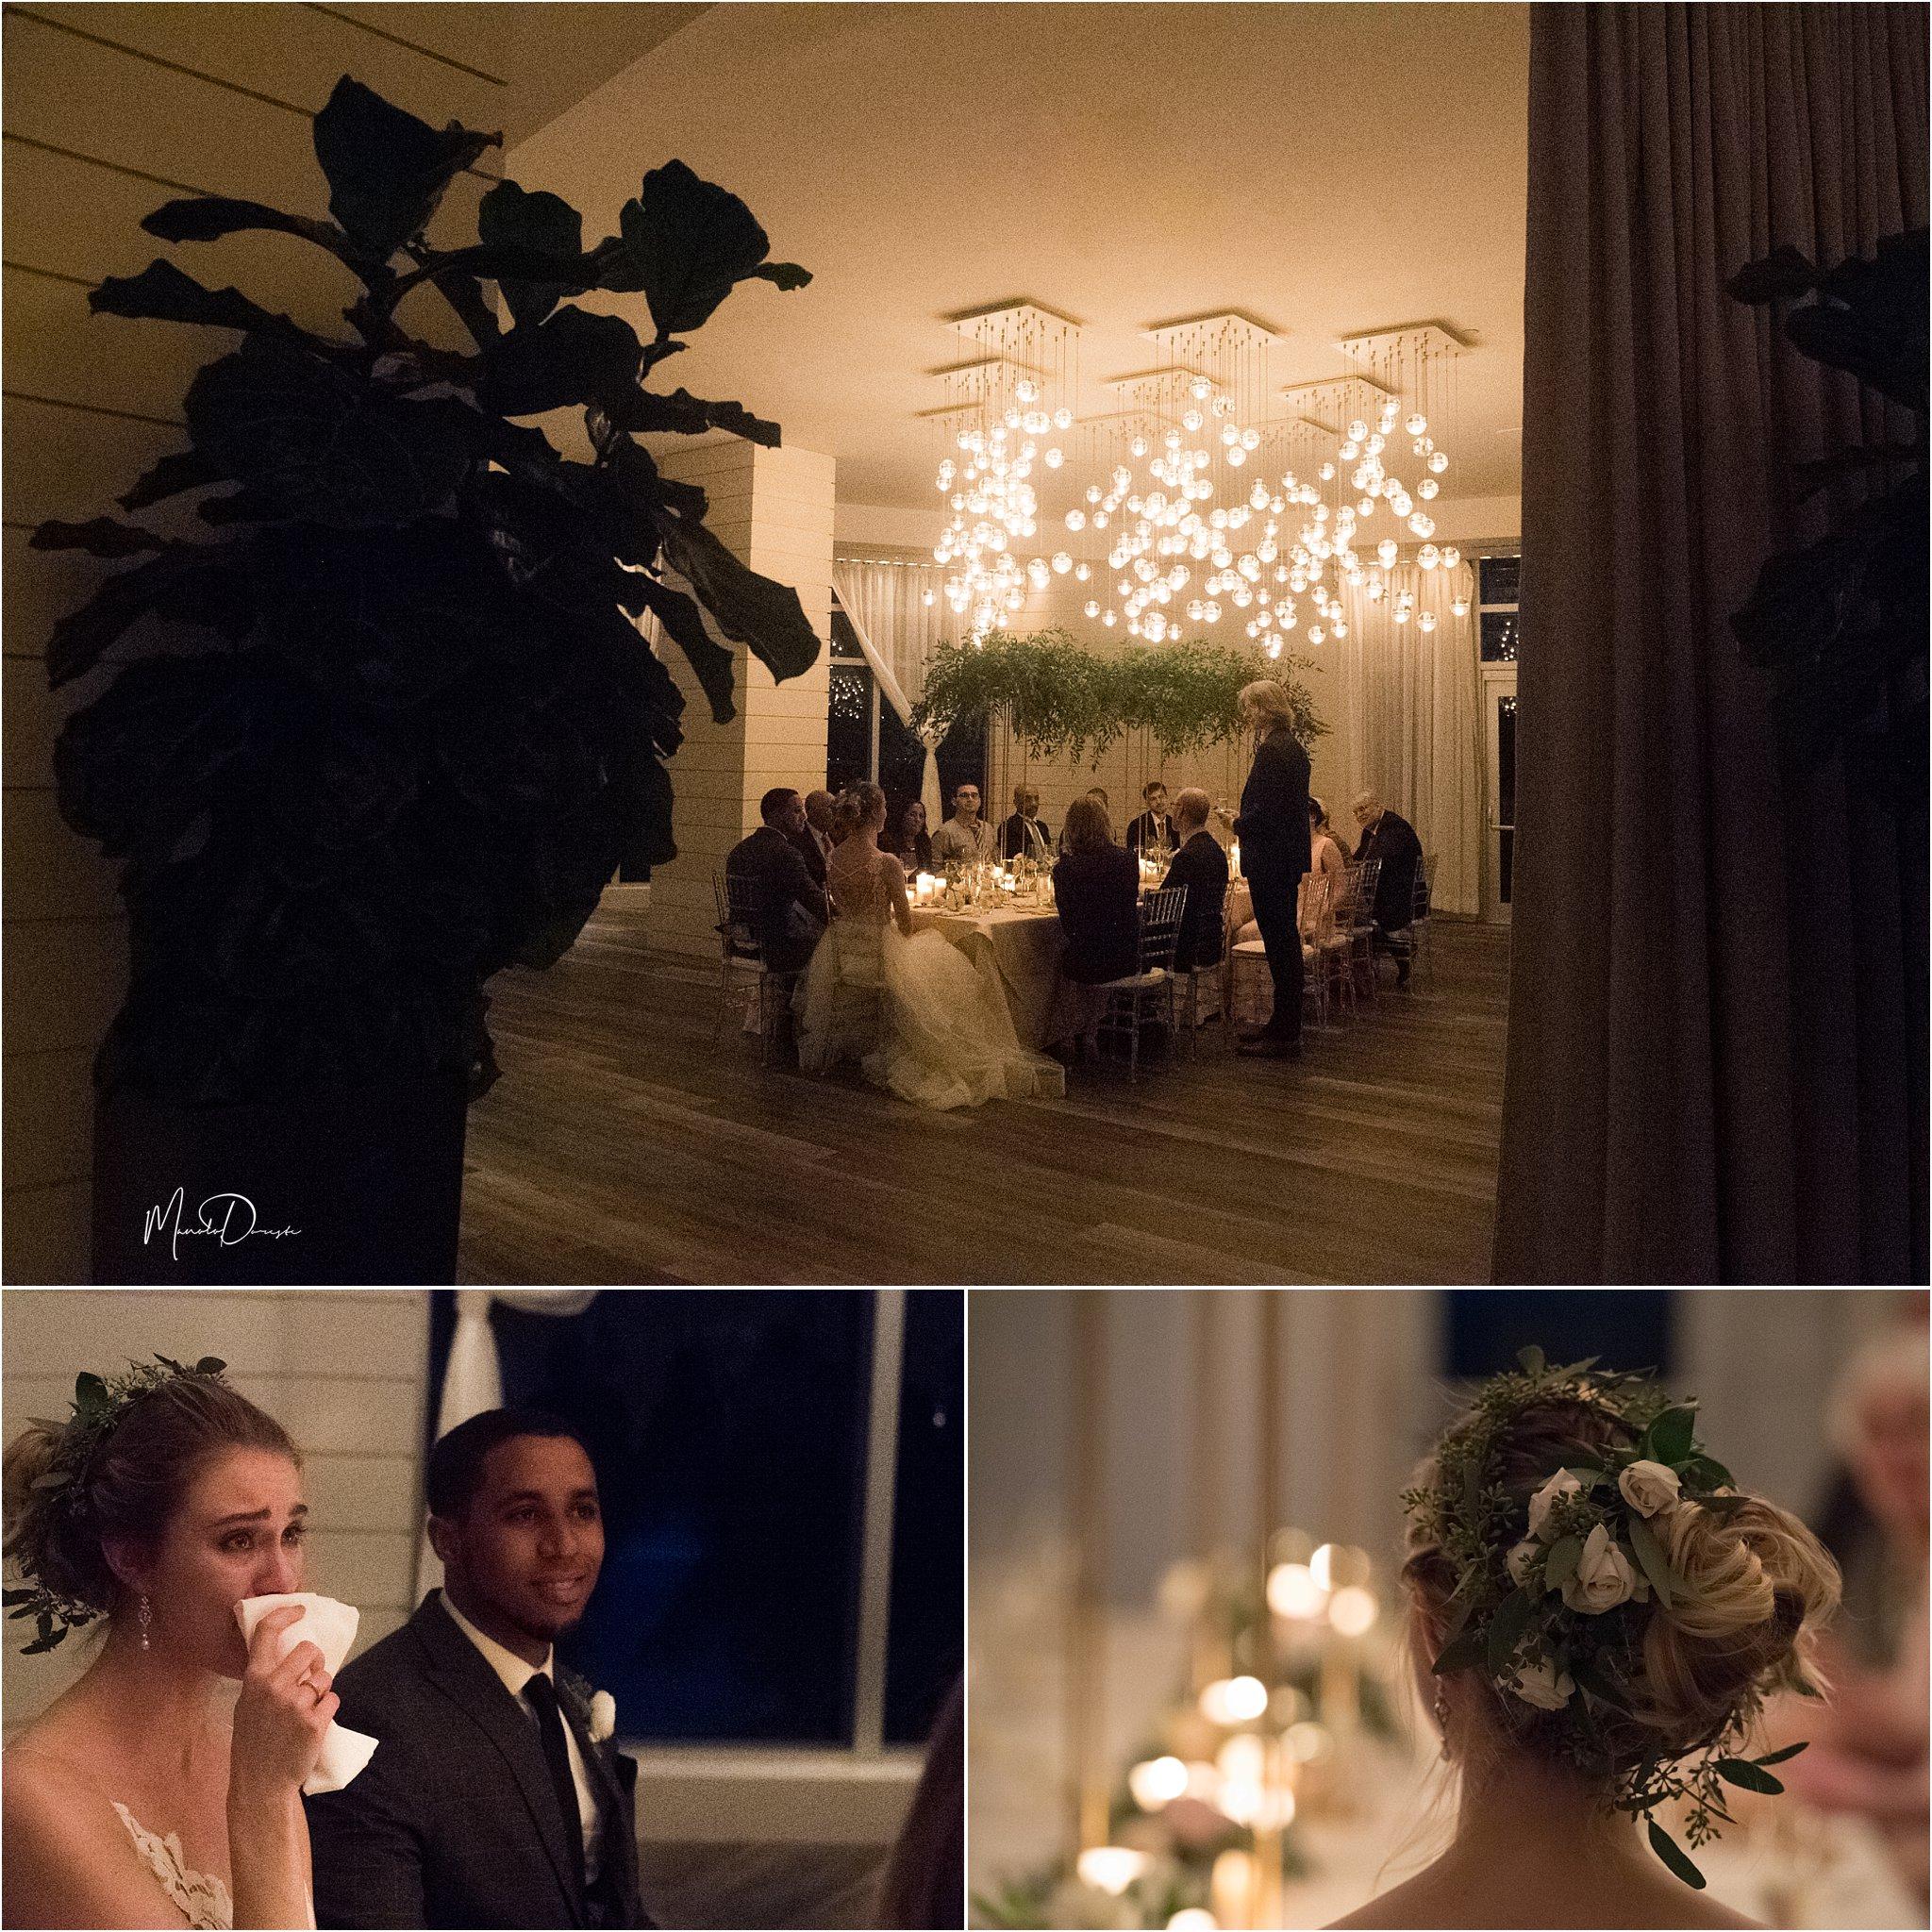 00888_ManoloDoreste_InFocusStudios_Wedding_Family_Photography_Miami_MiamiPhotographer.jpg